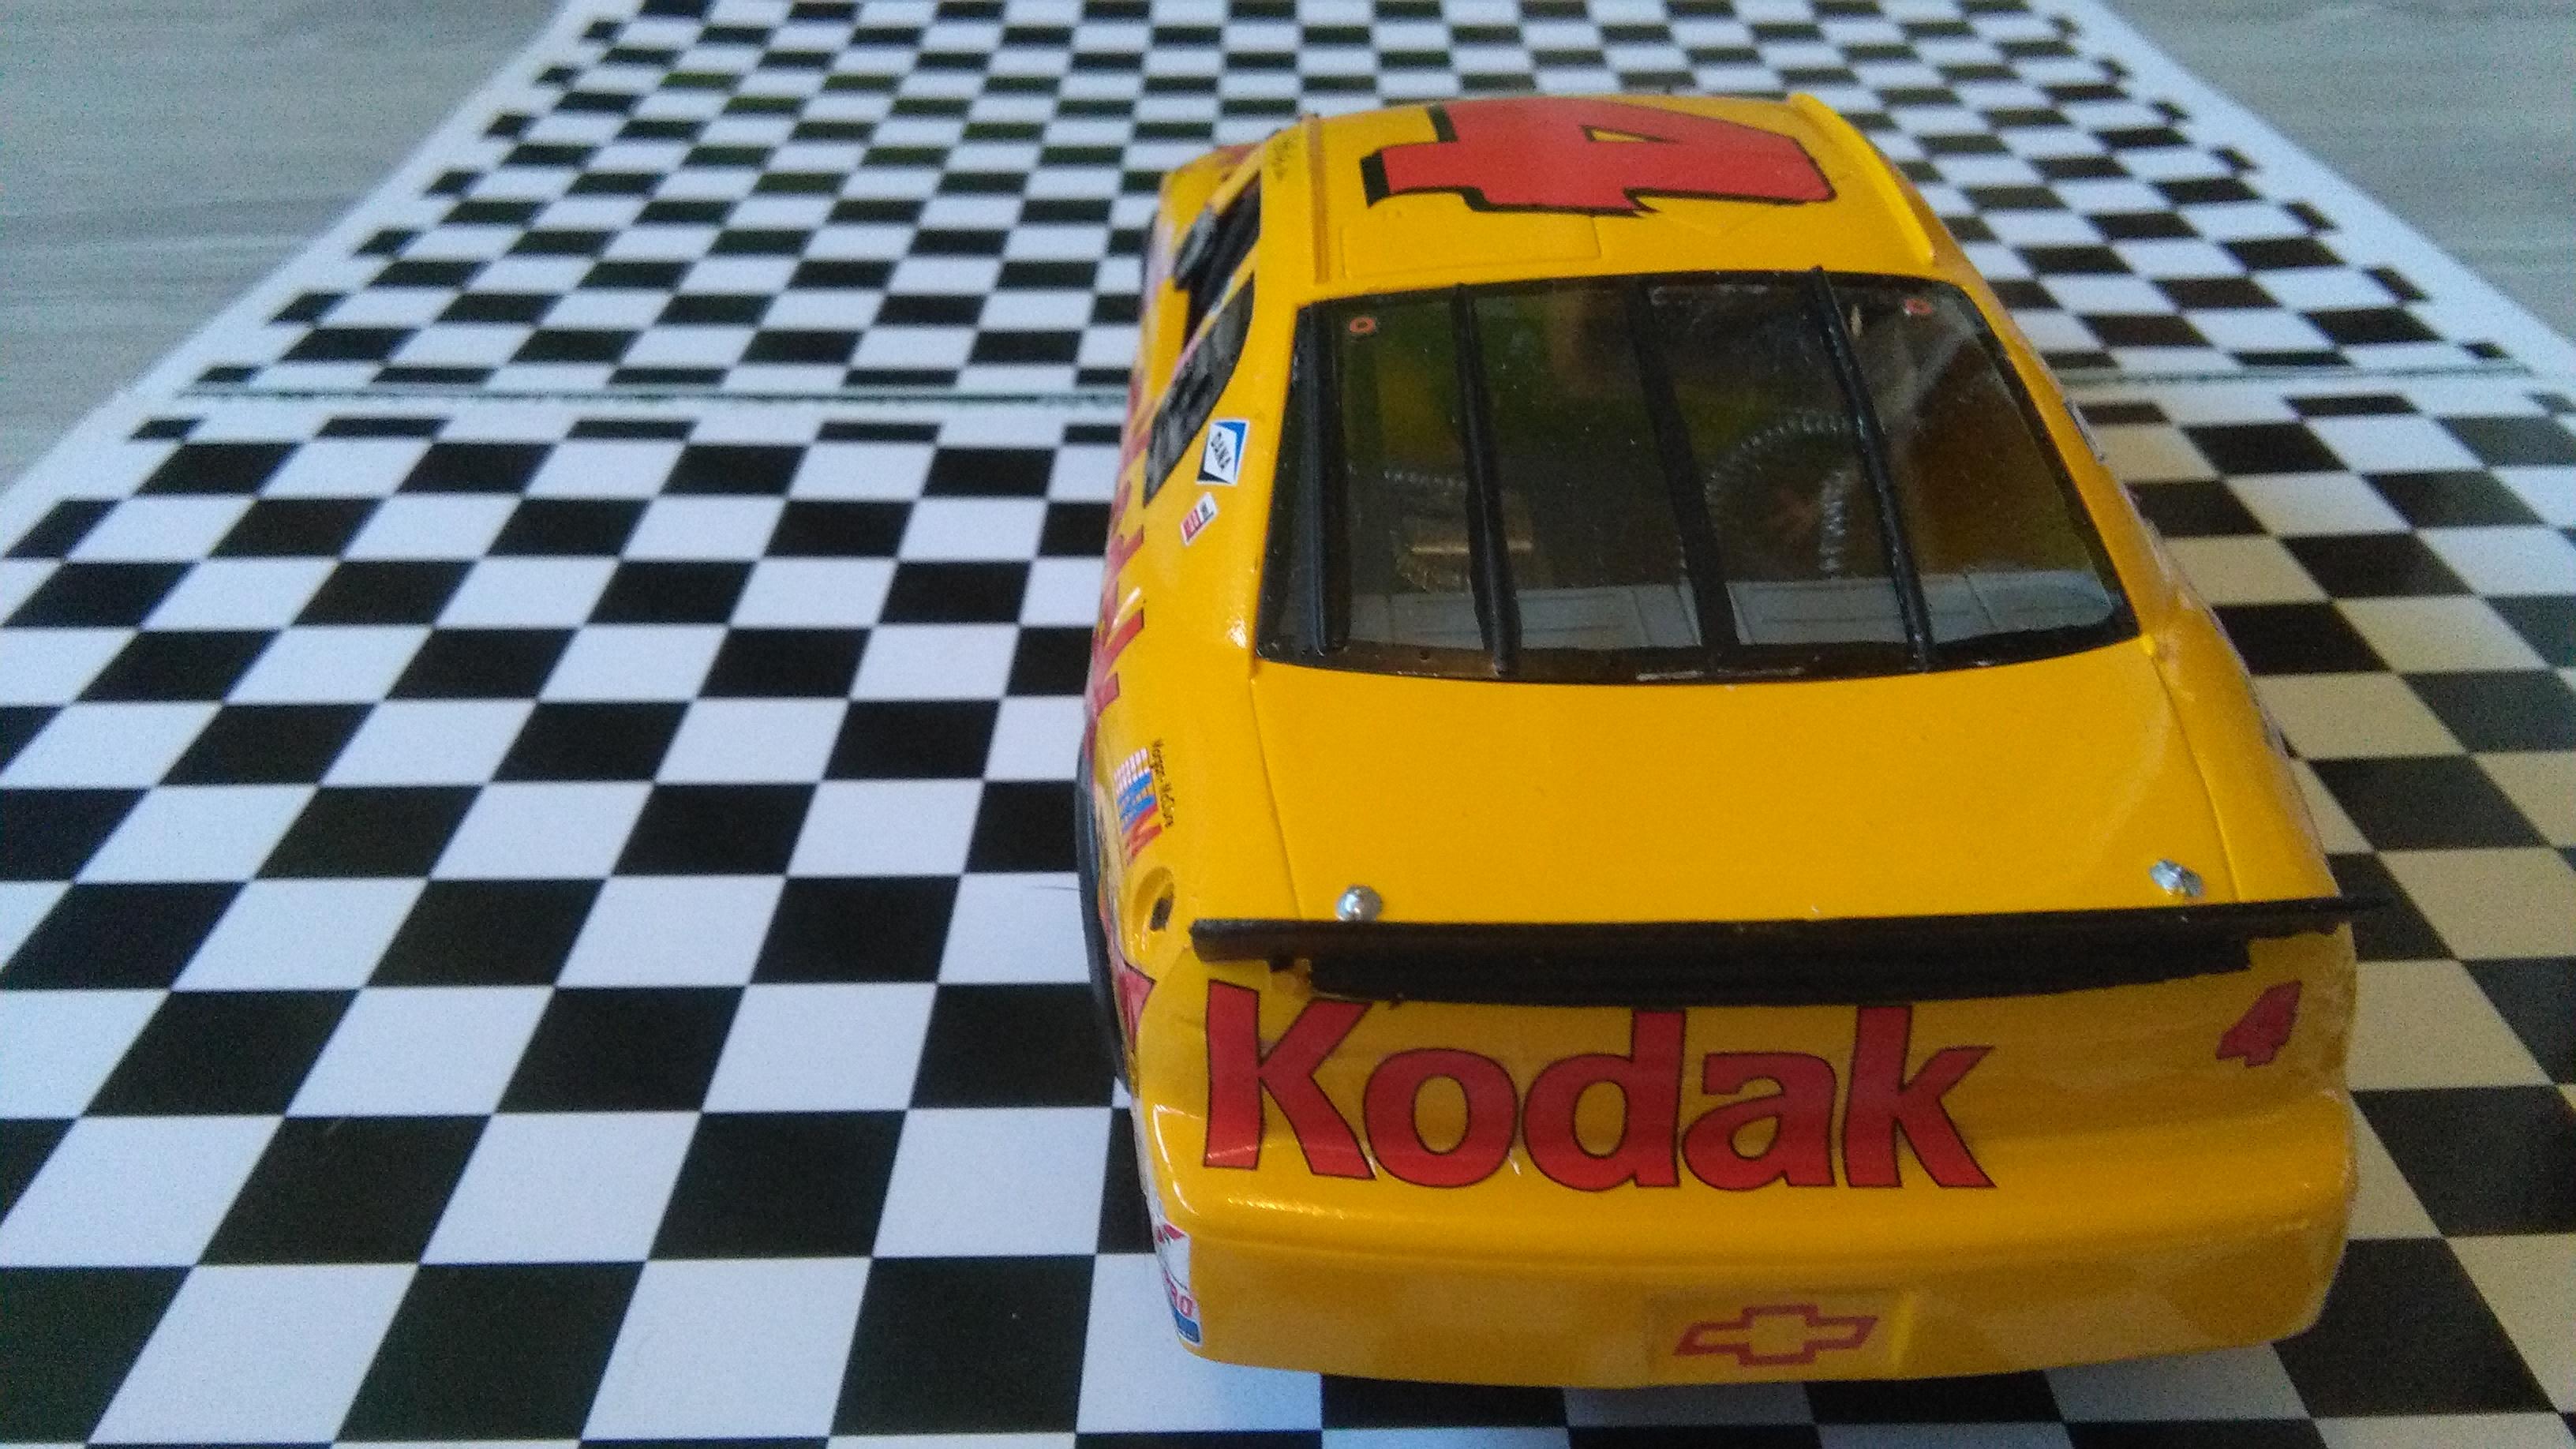 Chevy Monte-Carlo 1998 #4 Bobby Hamilton Kodak  269005IMG20170311174546